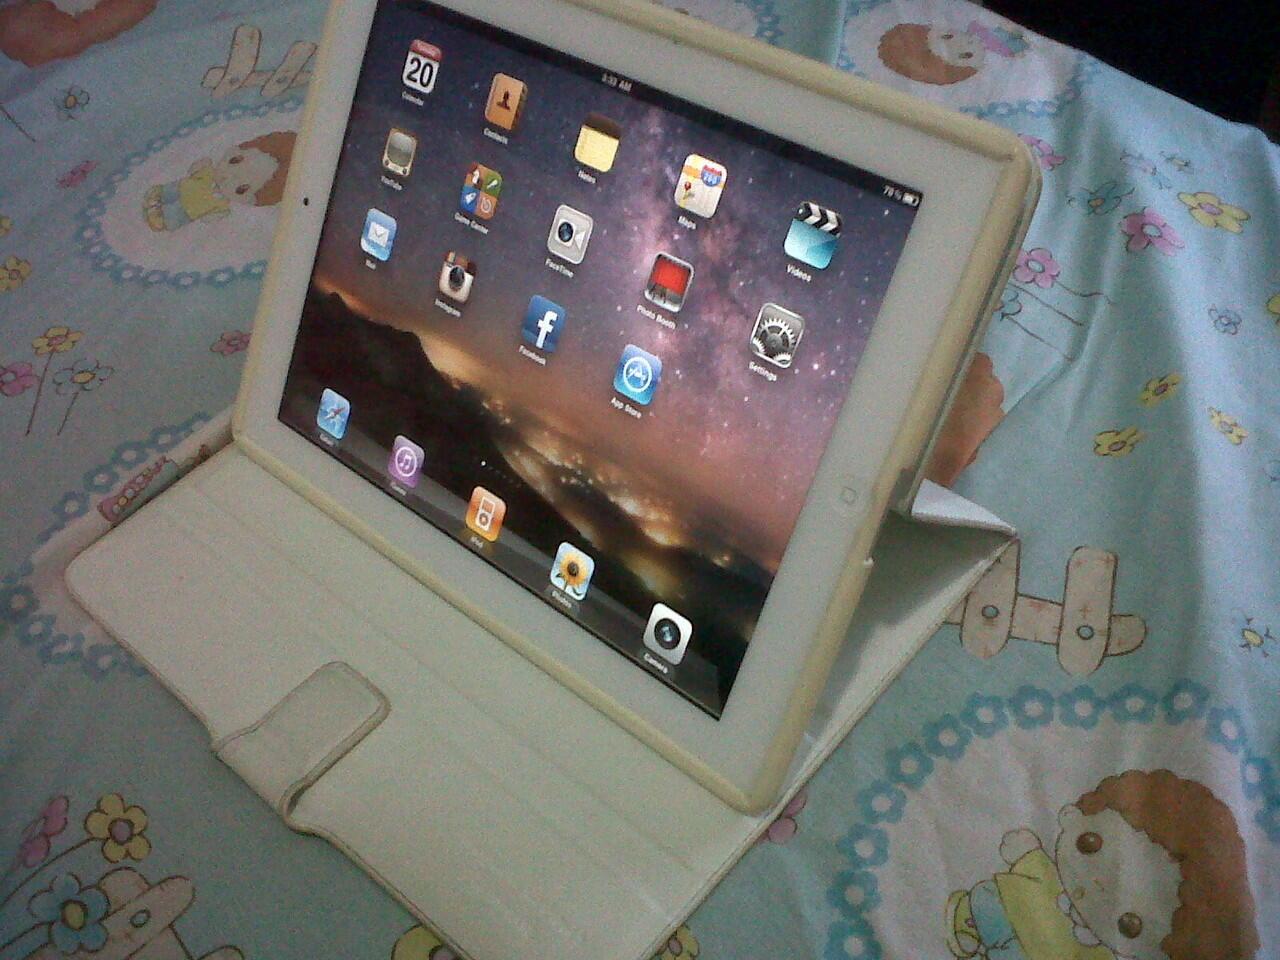 ipad 2 wifi only 32gb white